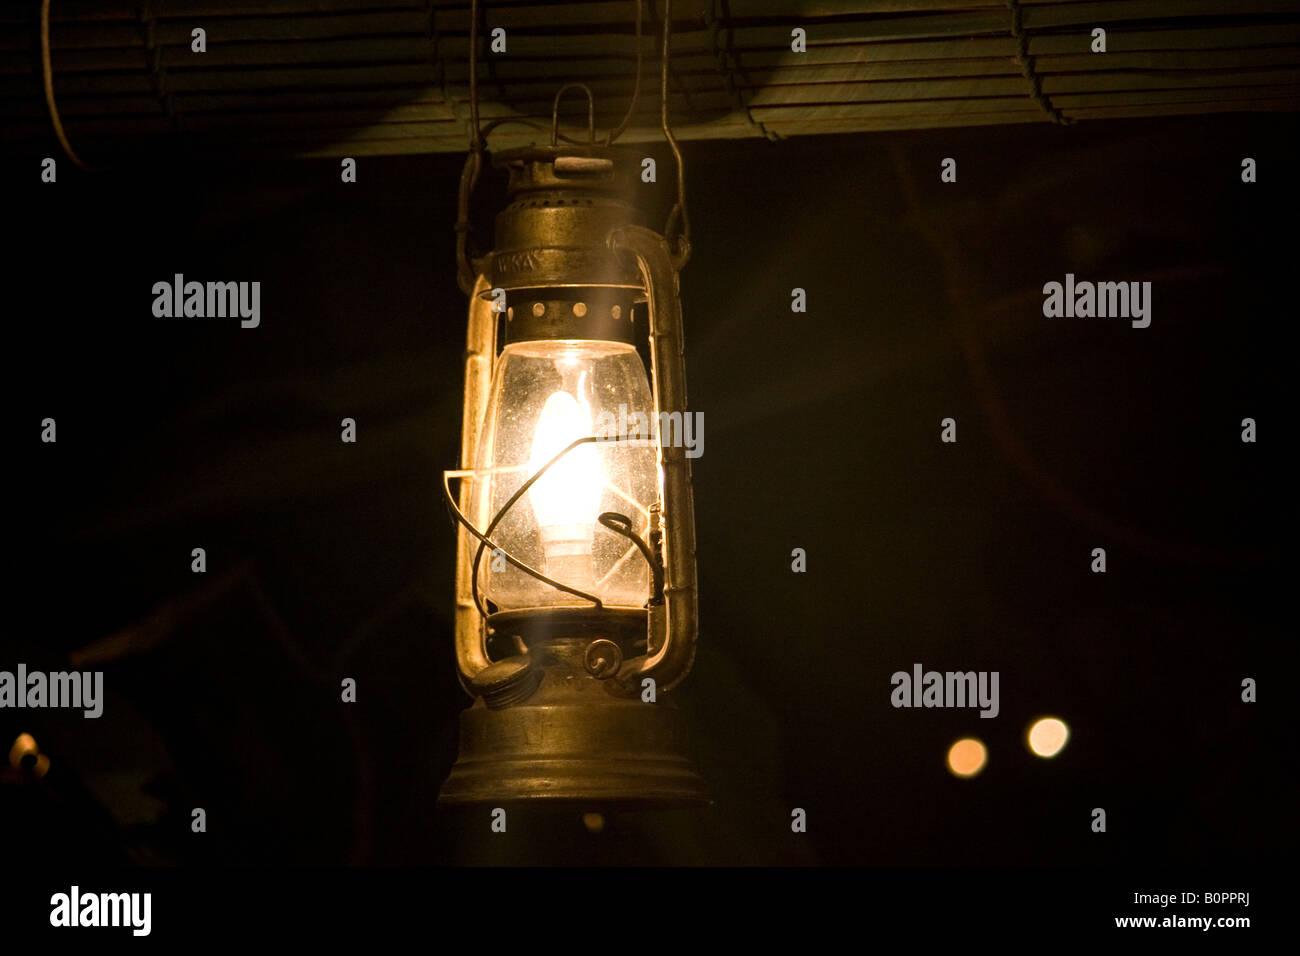 Hurricane lamp lit - Stock Image